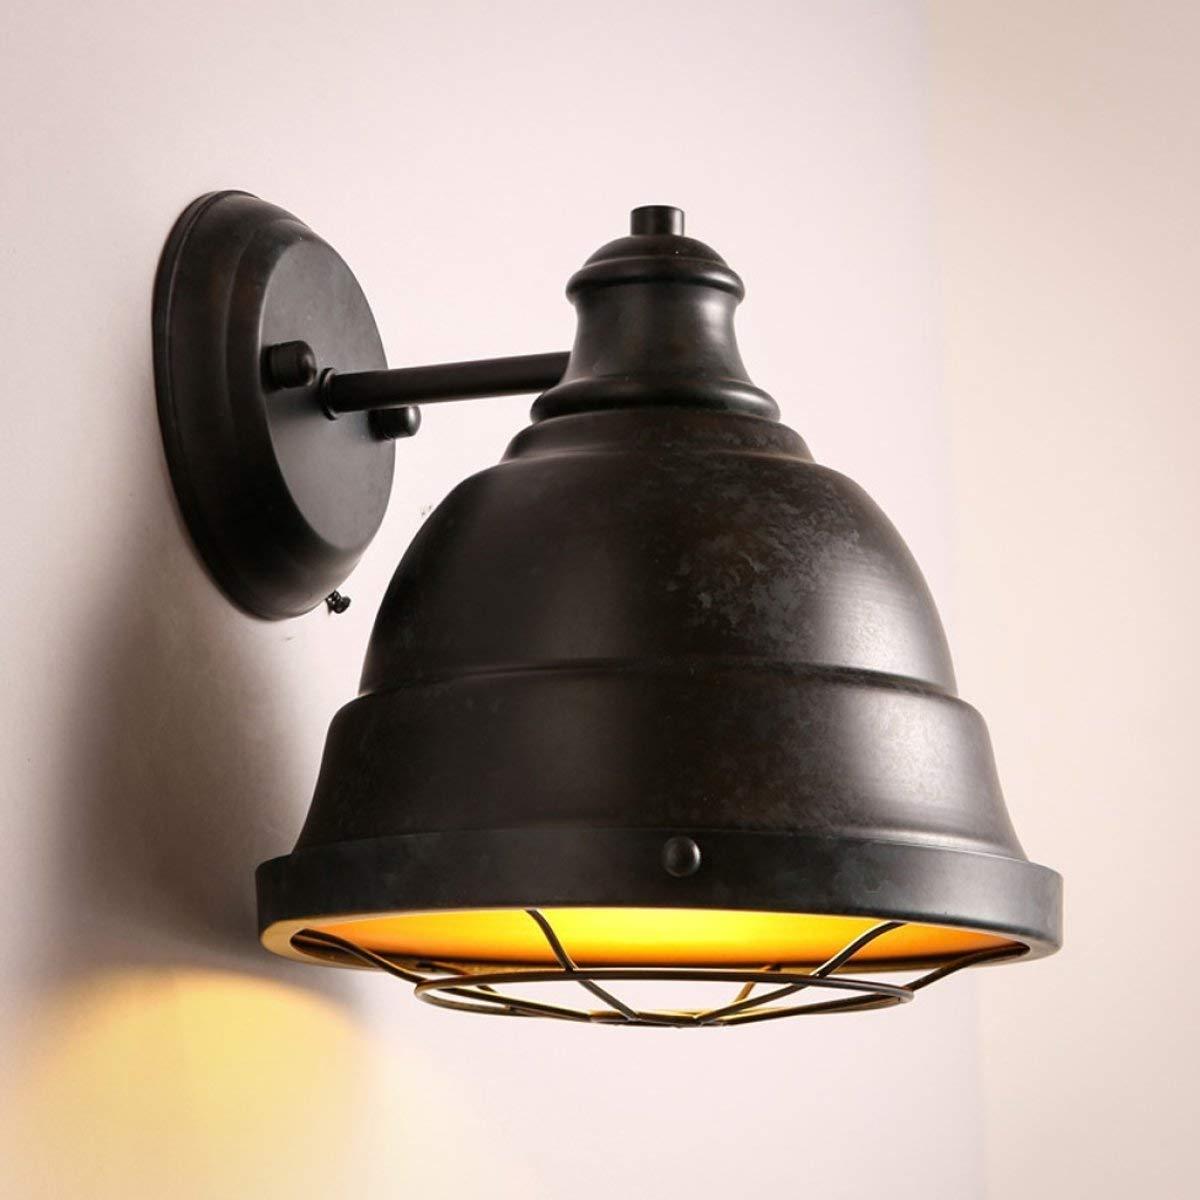 BXJ ウォールライトレトロノスタルジックウォールランプレストランリビングルームの寝室の廊下シンプル人格ウォールランプE27光源ウォールランプ B07R7GN8NK